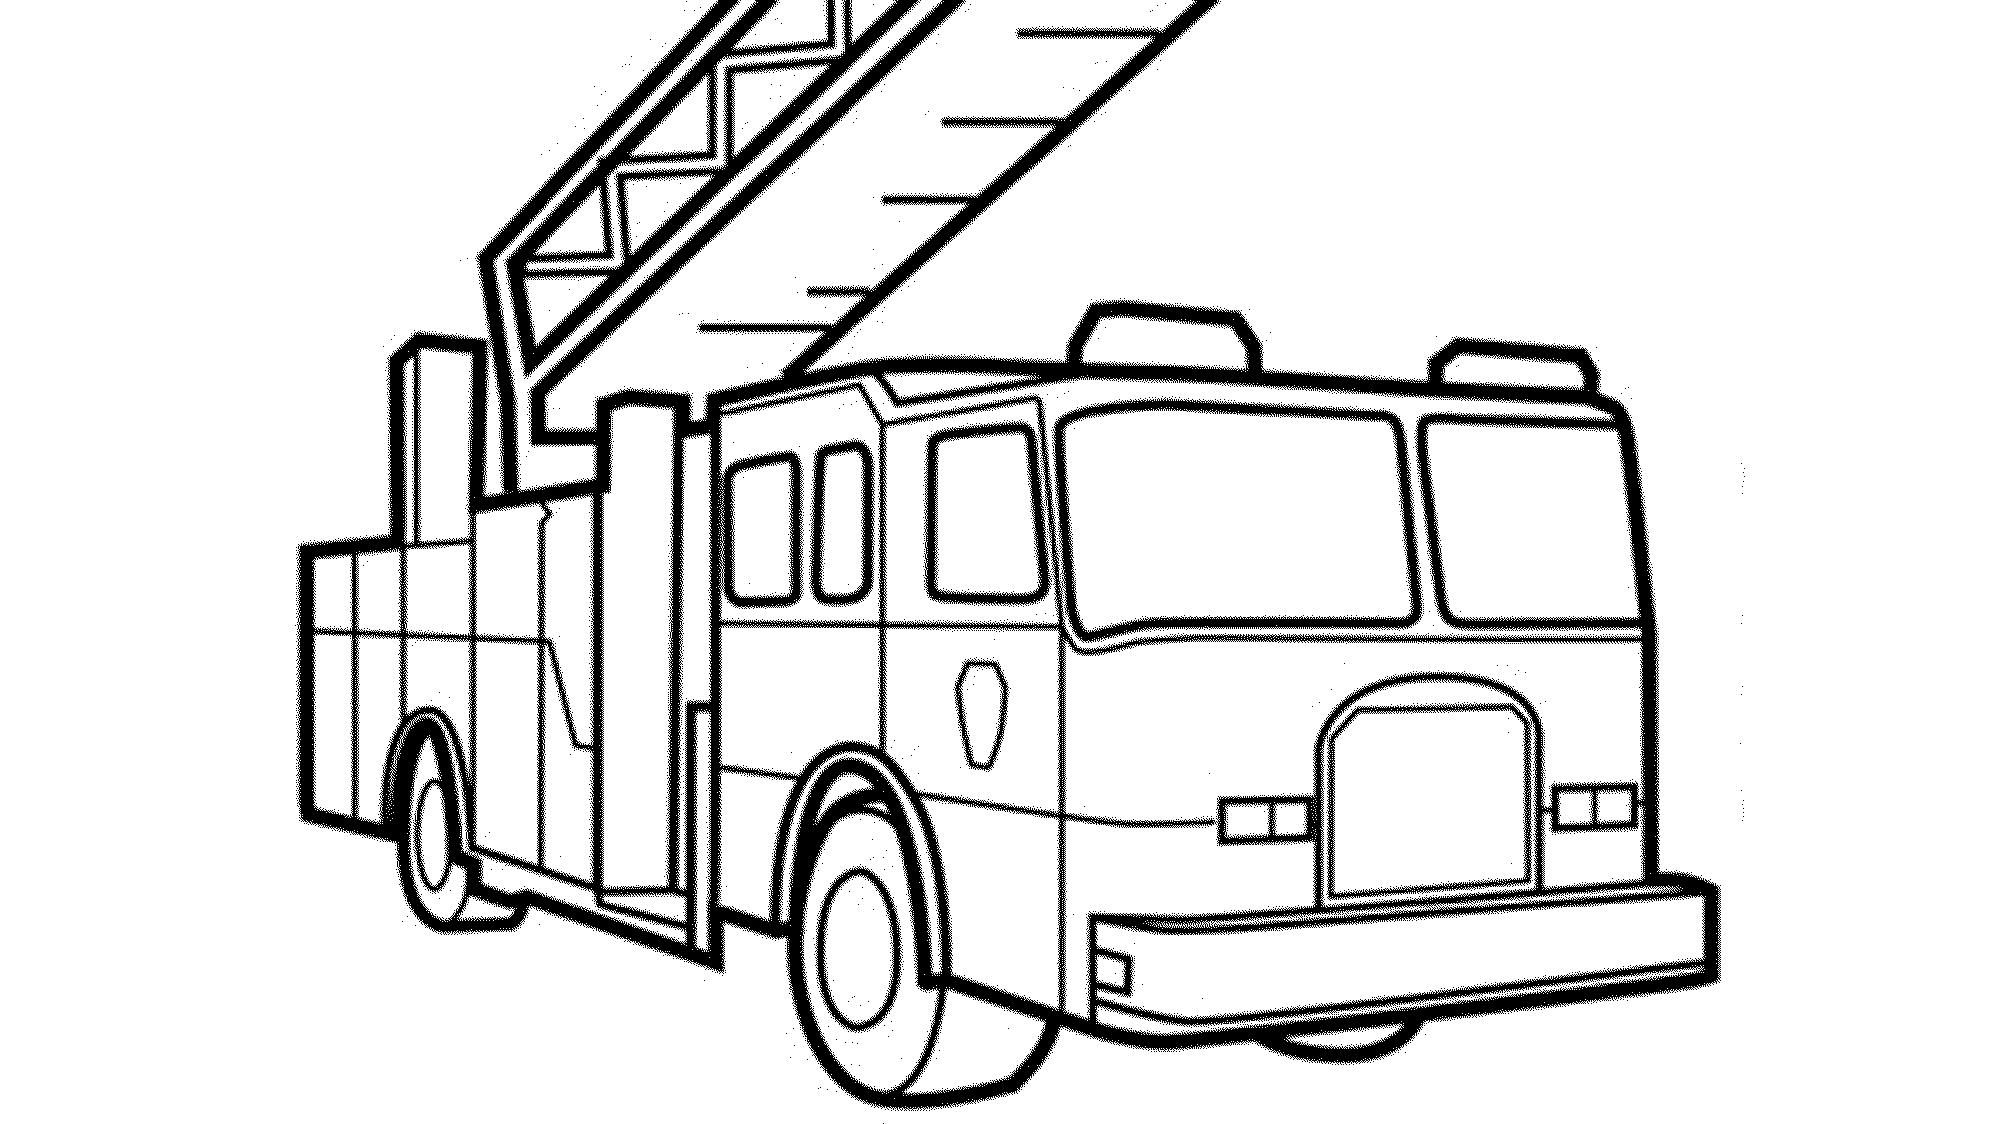 Coloring Pages Fire Truck - Democraciaejustica